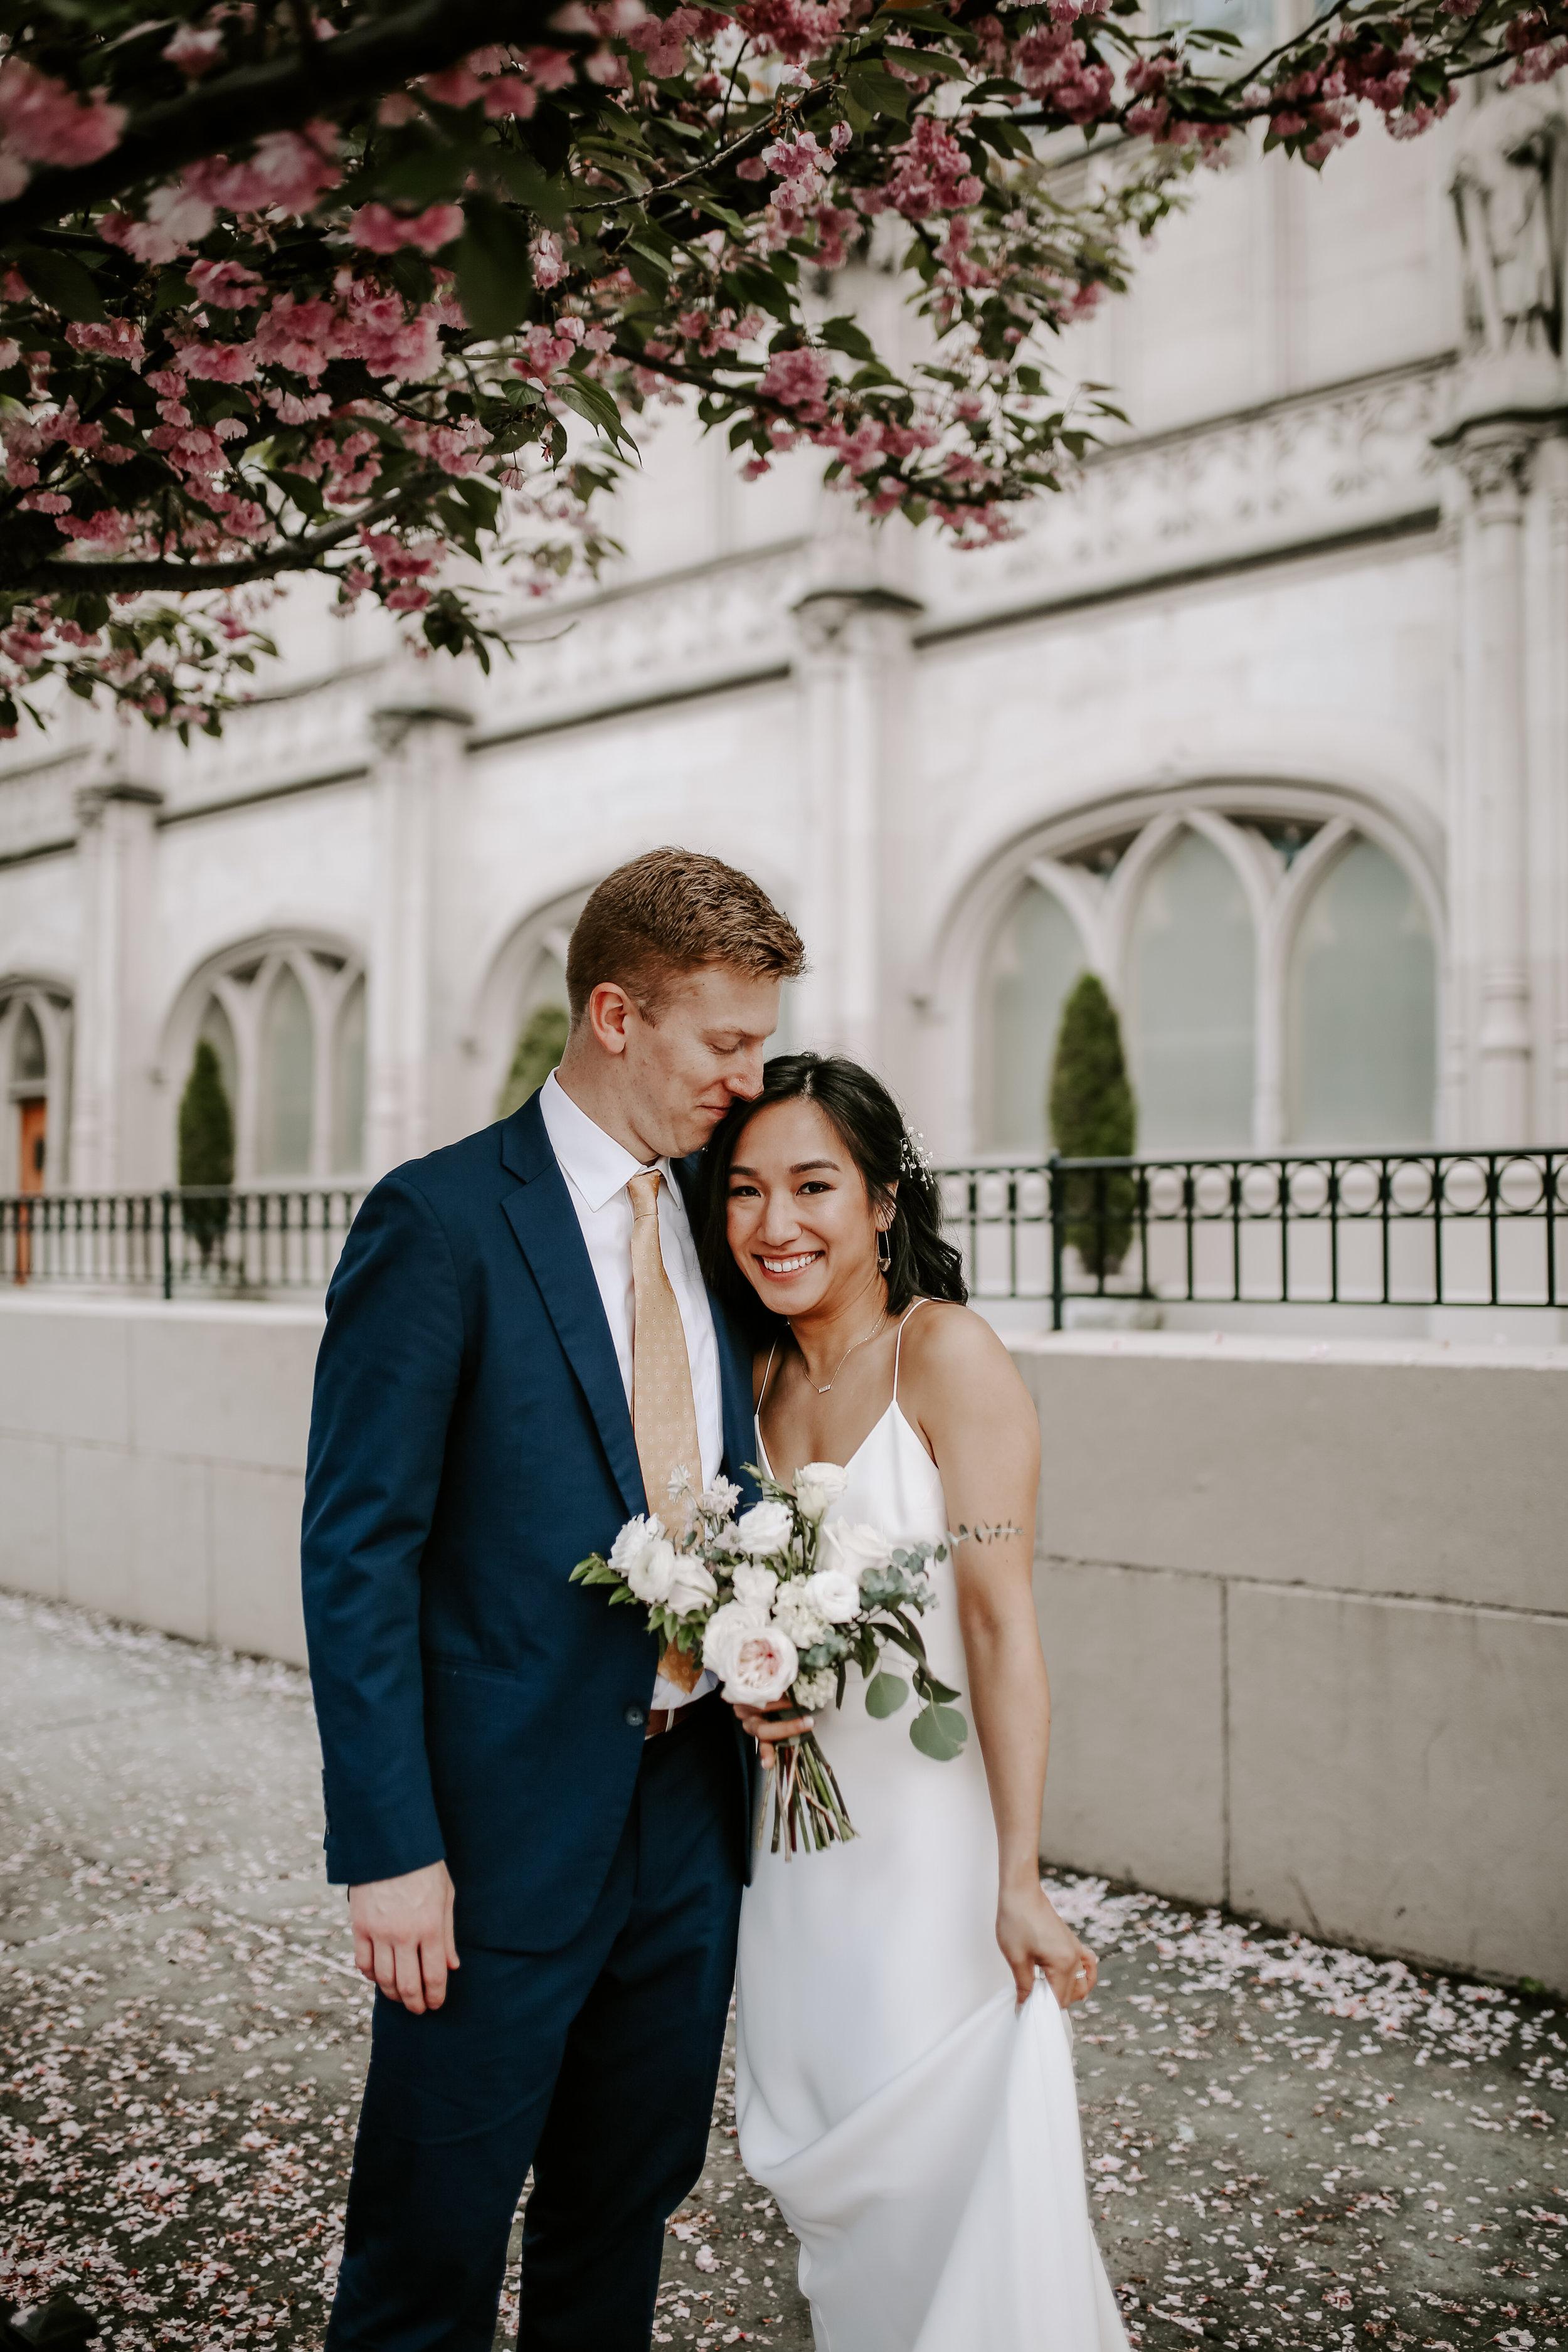 TheNichols_Married_2019-22.jpg